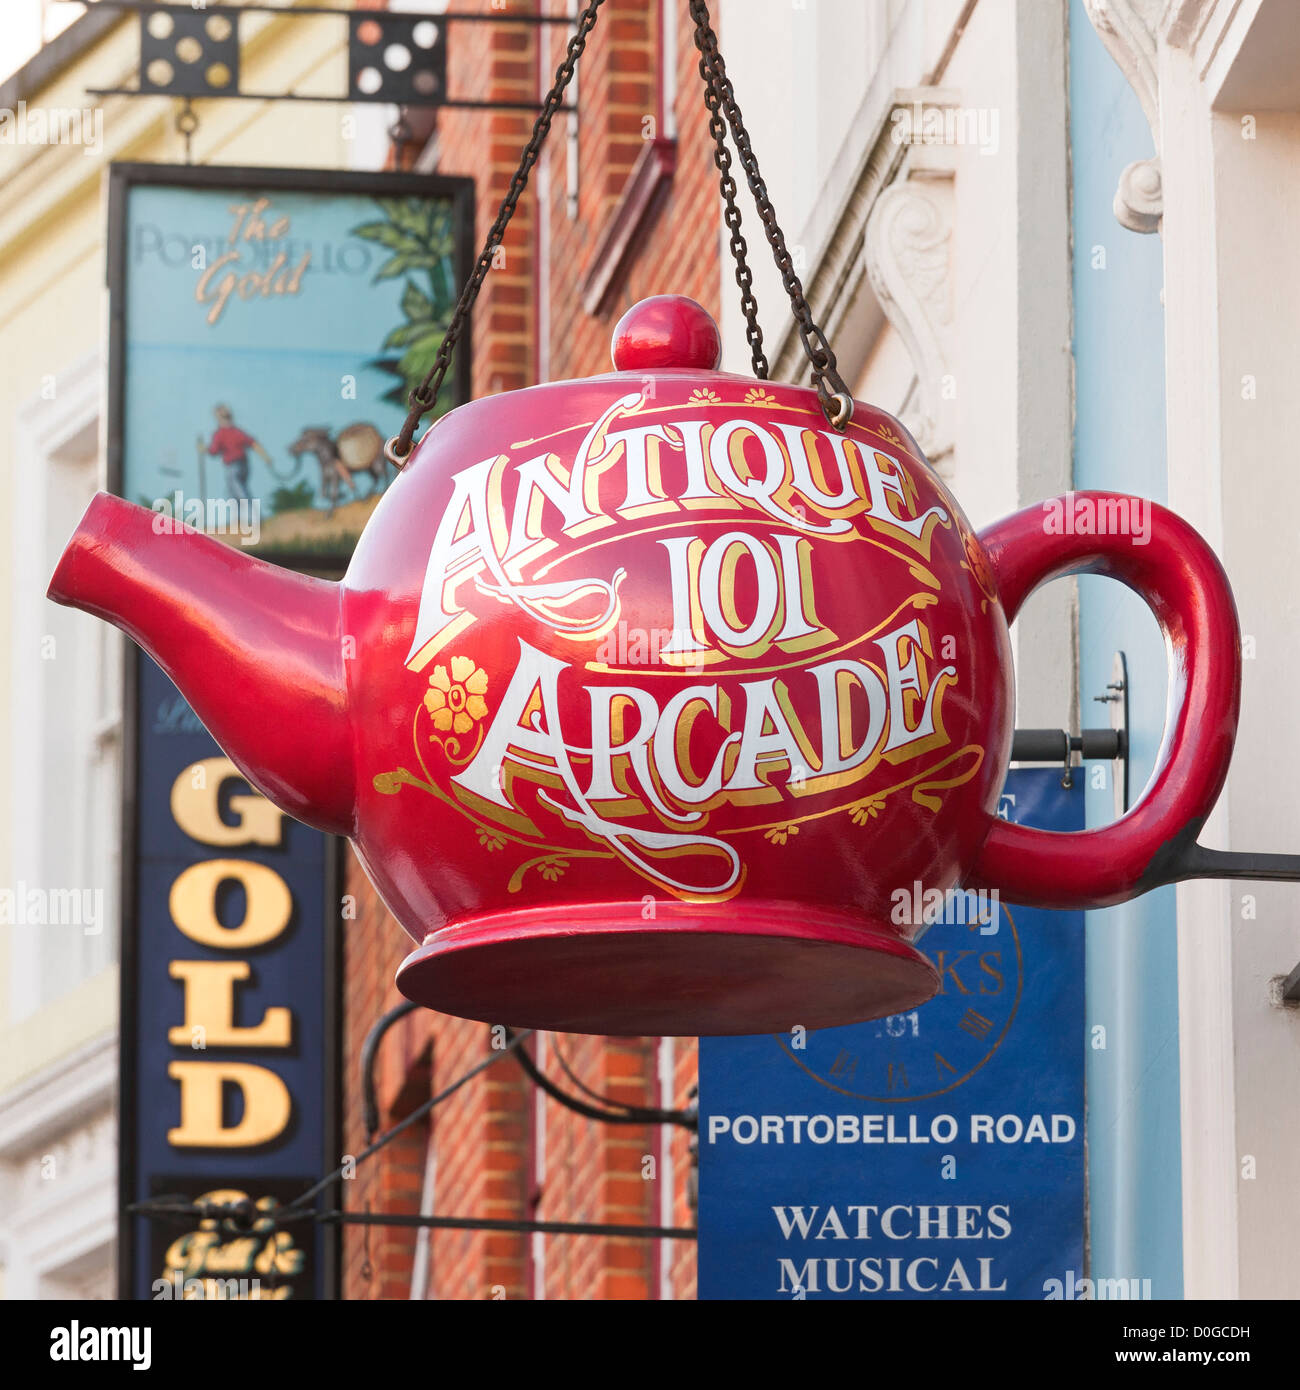 London, Portobello Road, Notting Hill. Big red teapot shop sign for antiques mall the Antique 101 Arcade on Portobello - Stock Image